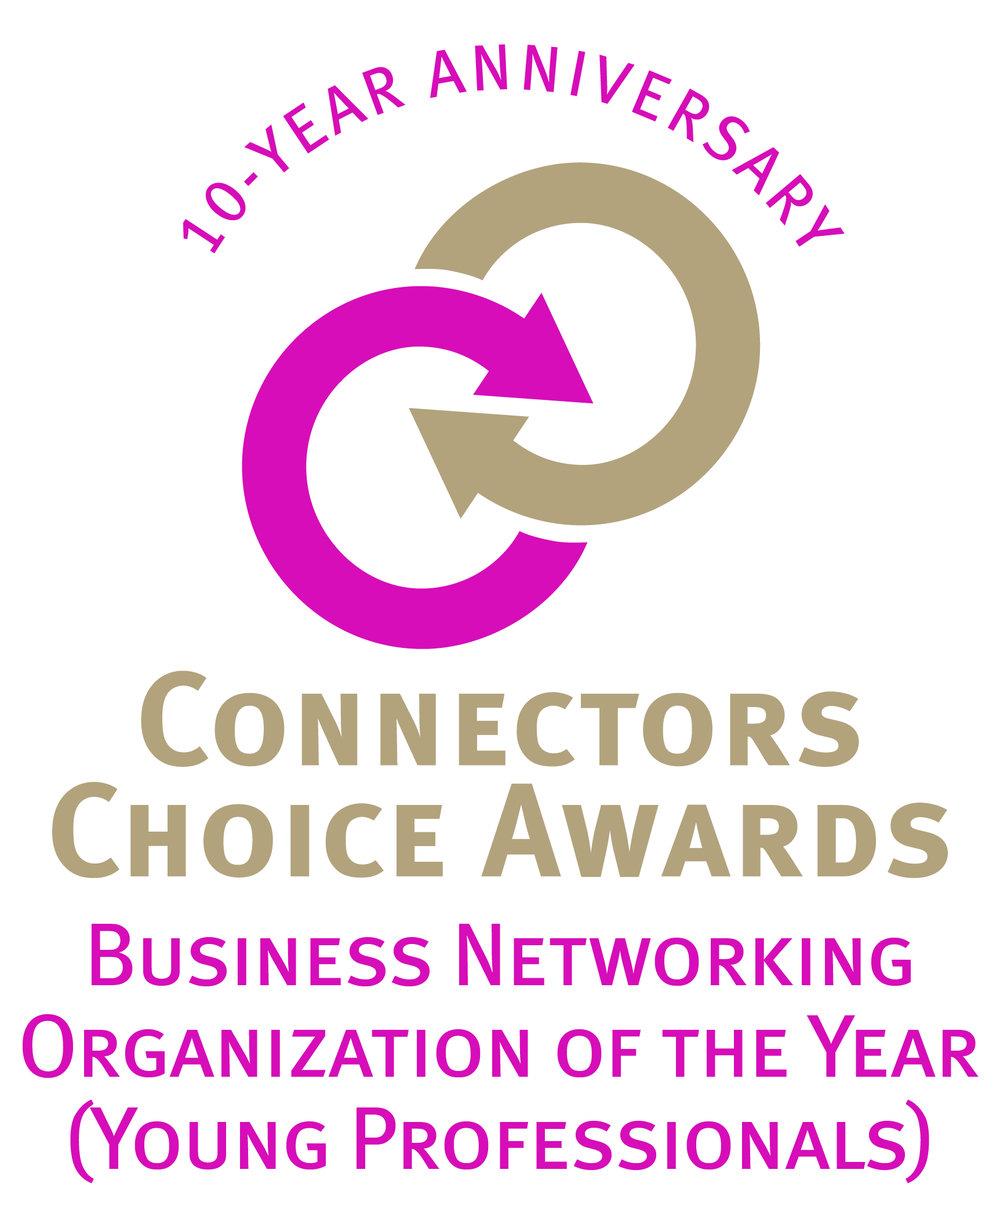 2017 CCA Logo-YoungPro.jpg